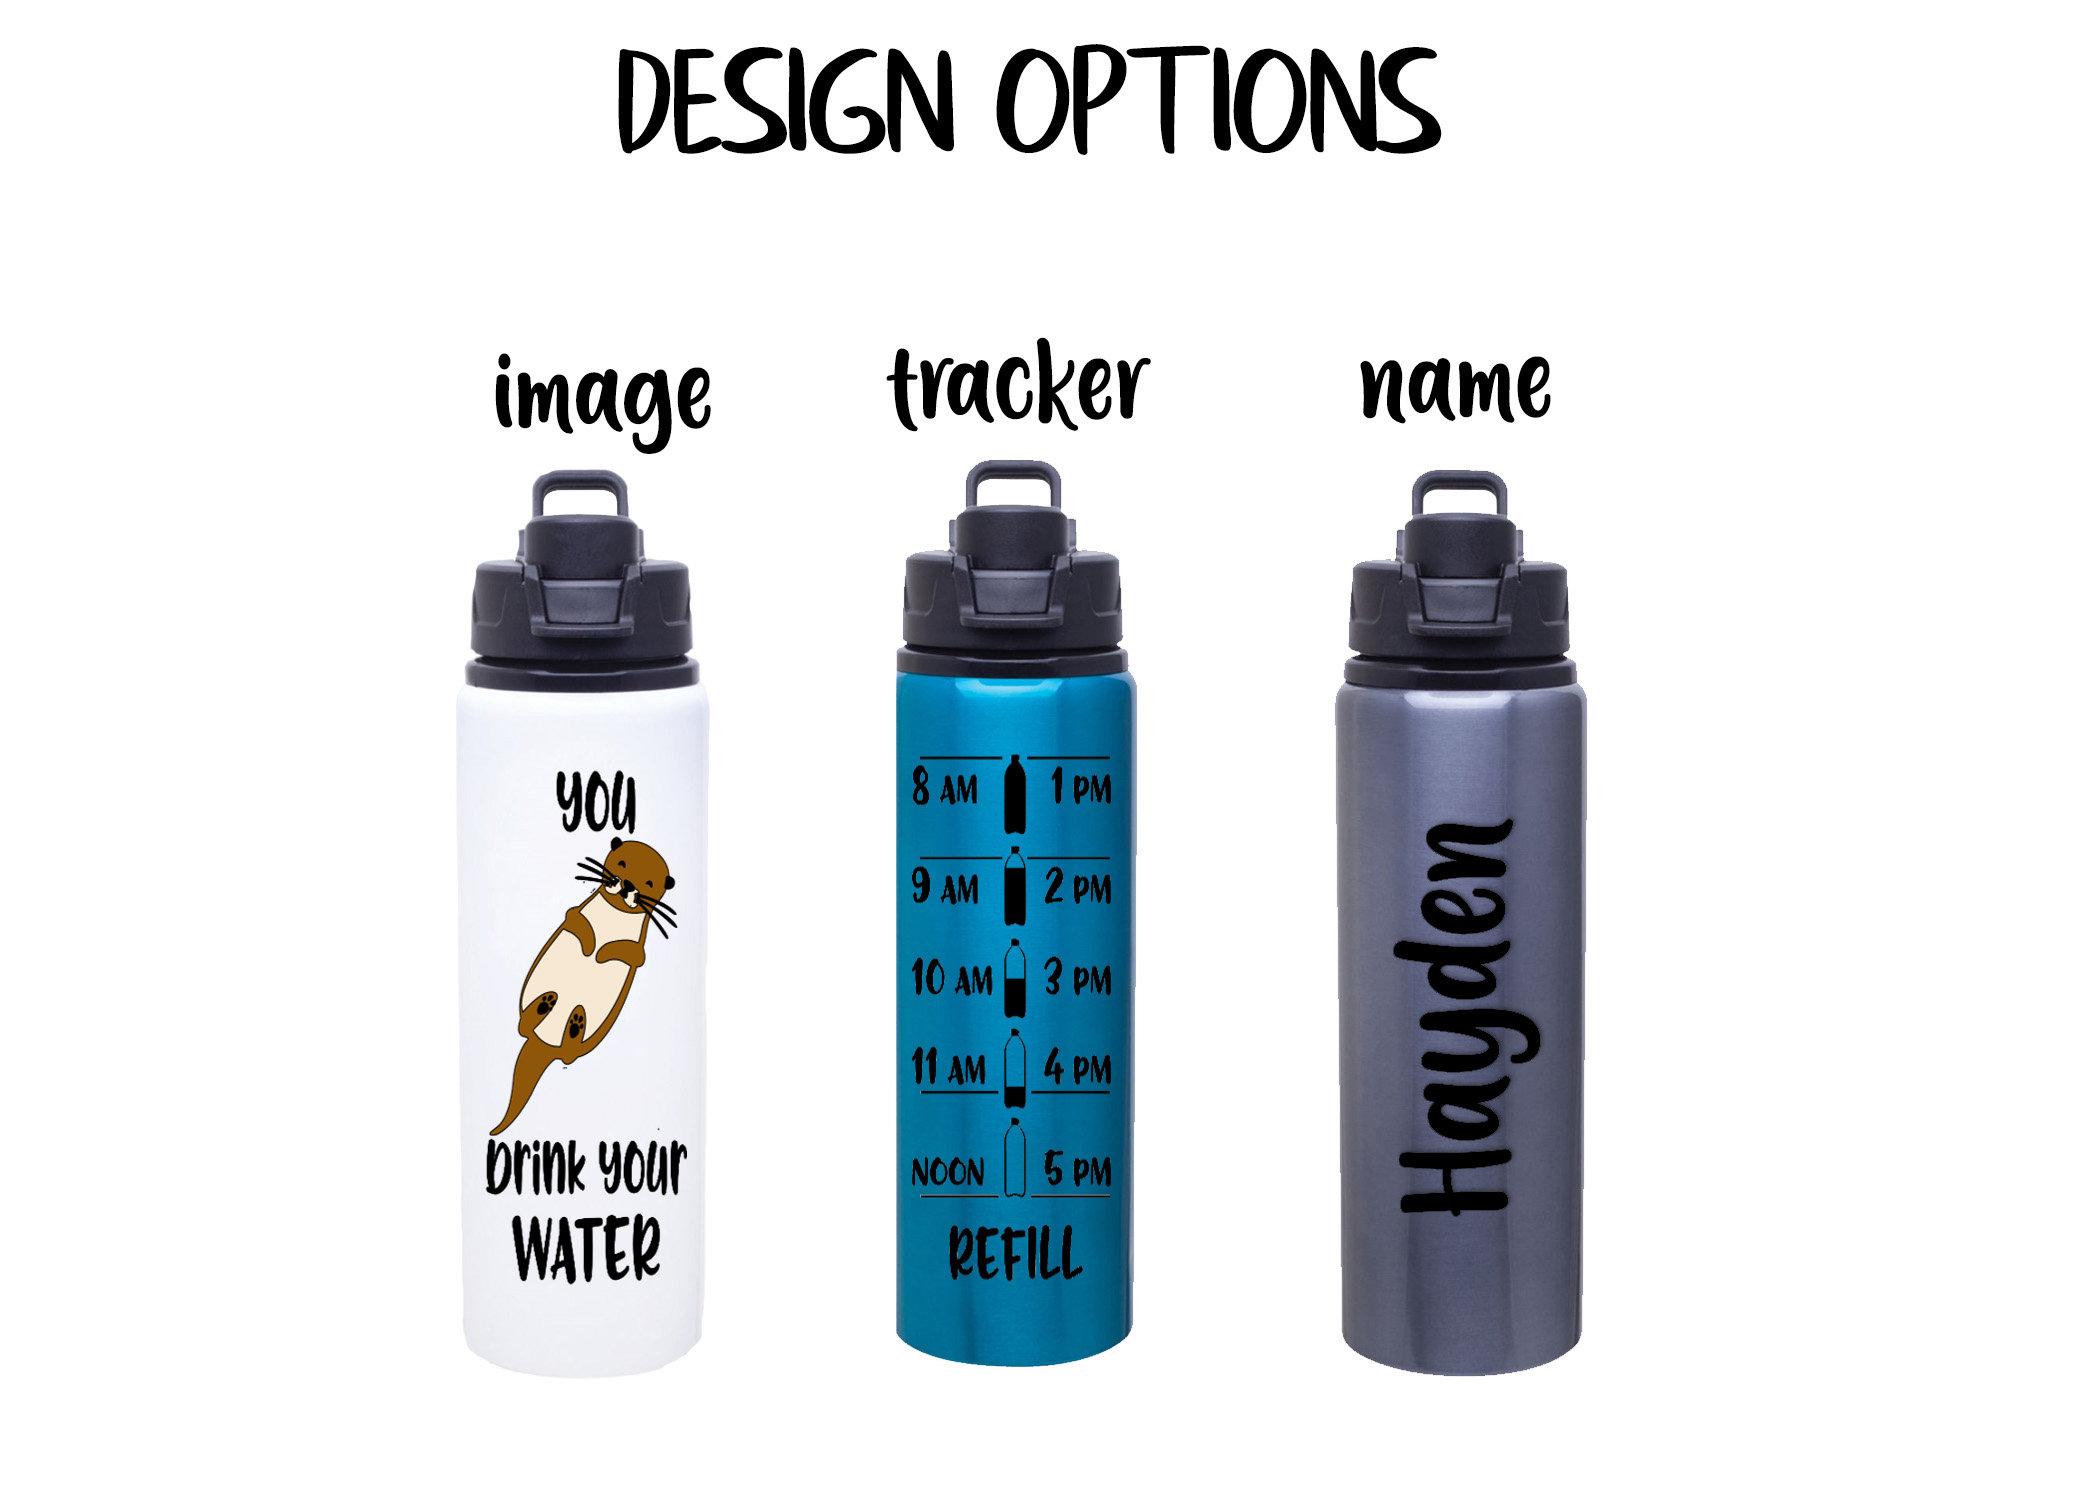 e5c0fd4153 Custom water bottle. Personalized otter bottle. gallery photo gallery photo  gallery photo gallery photo gallery photo gallery photo gallery photo  gallery ...